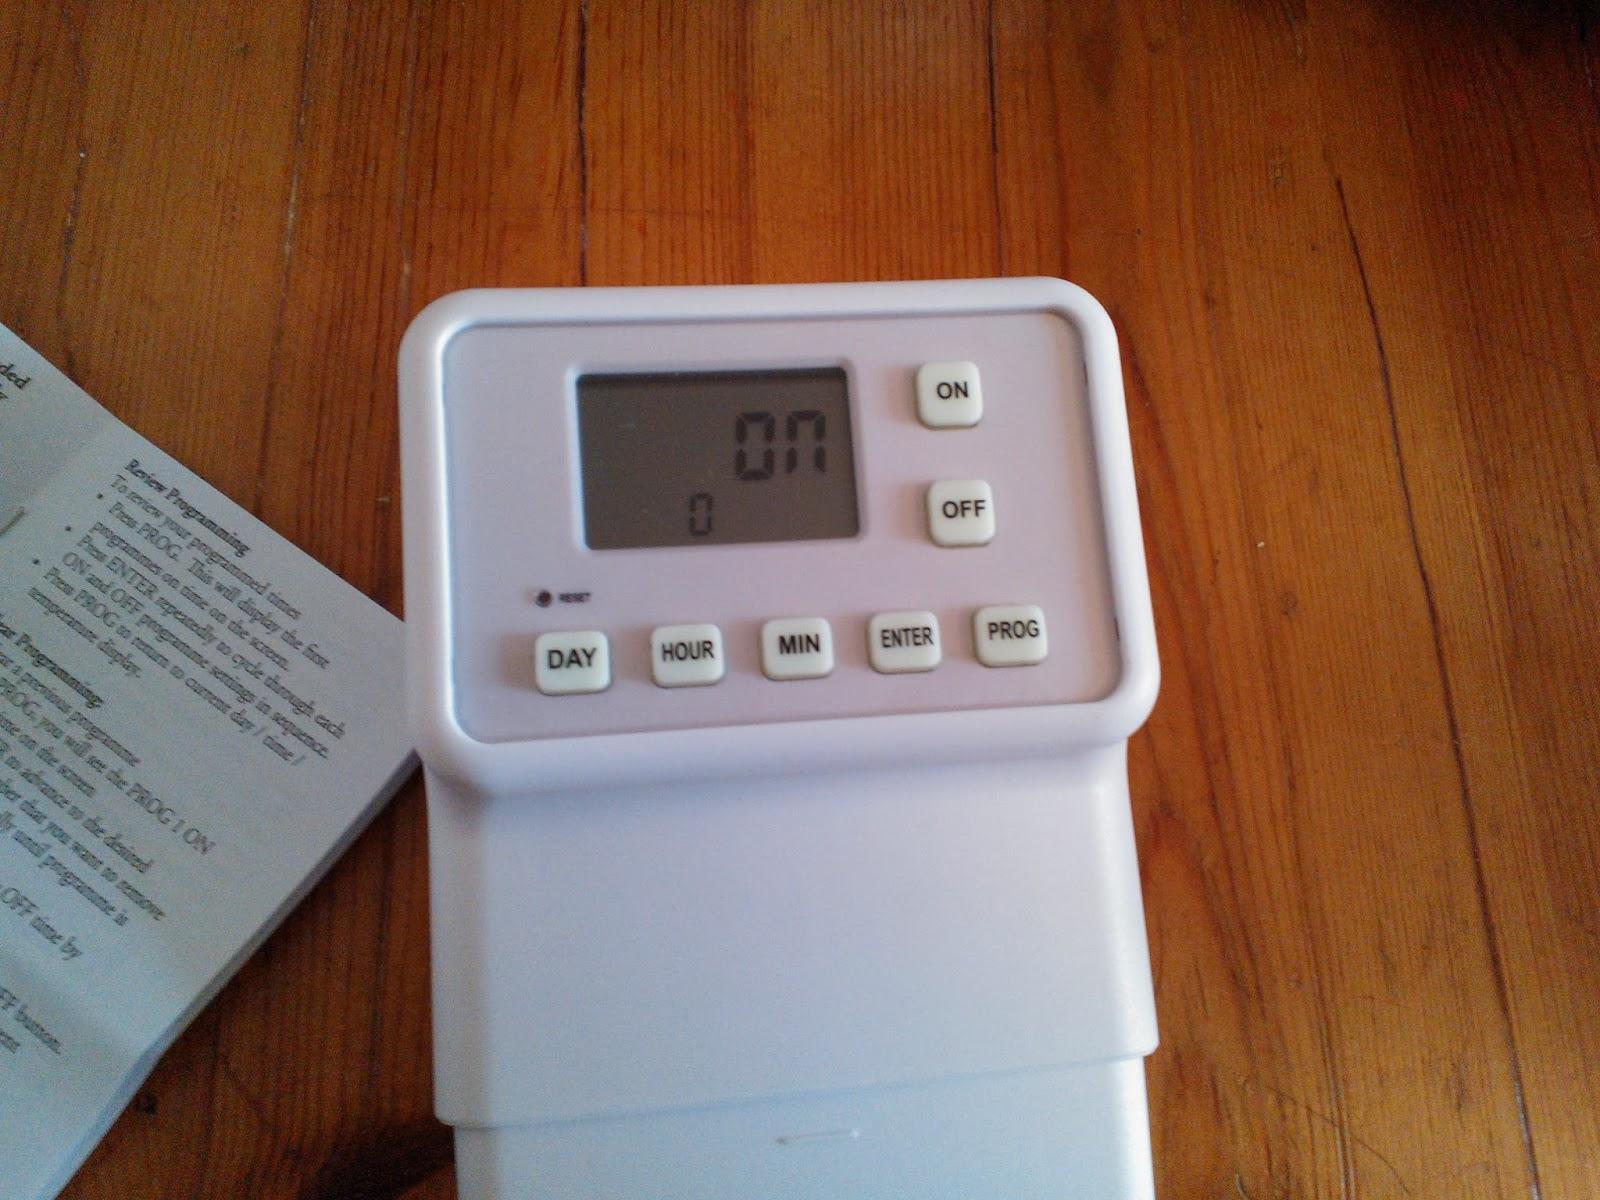 Easy to install digital light switch timer AdamokNet